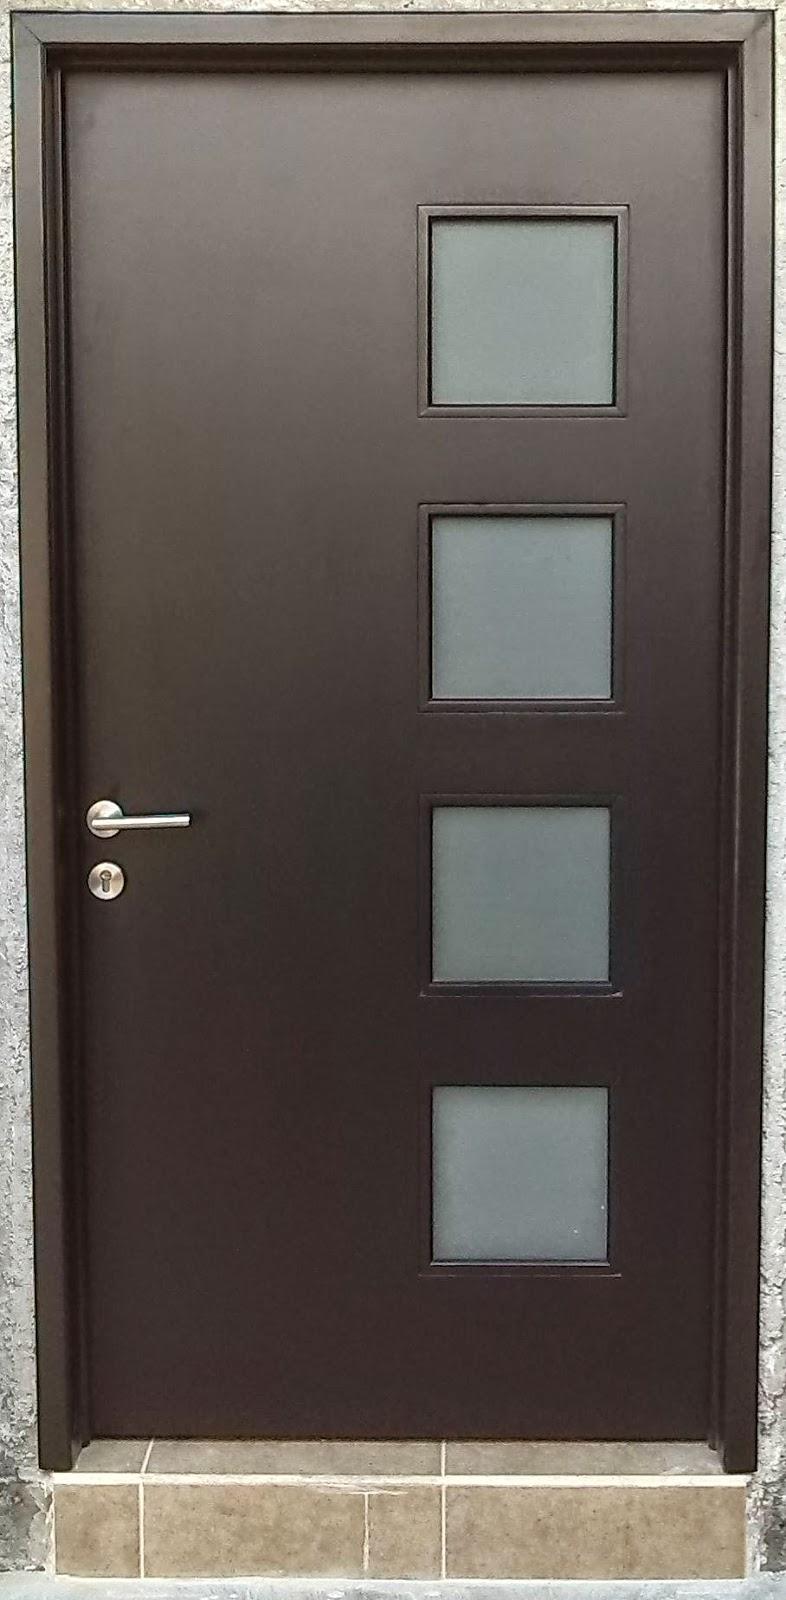 Carpinter as en ecatepec m xico puertas de madera for Puertas de madera interiores modernas